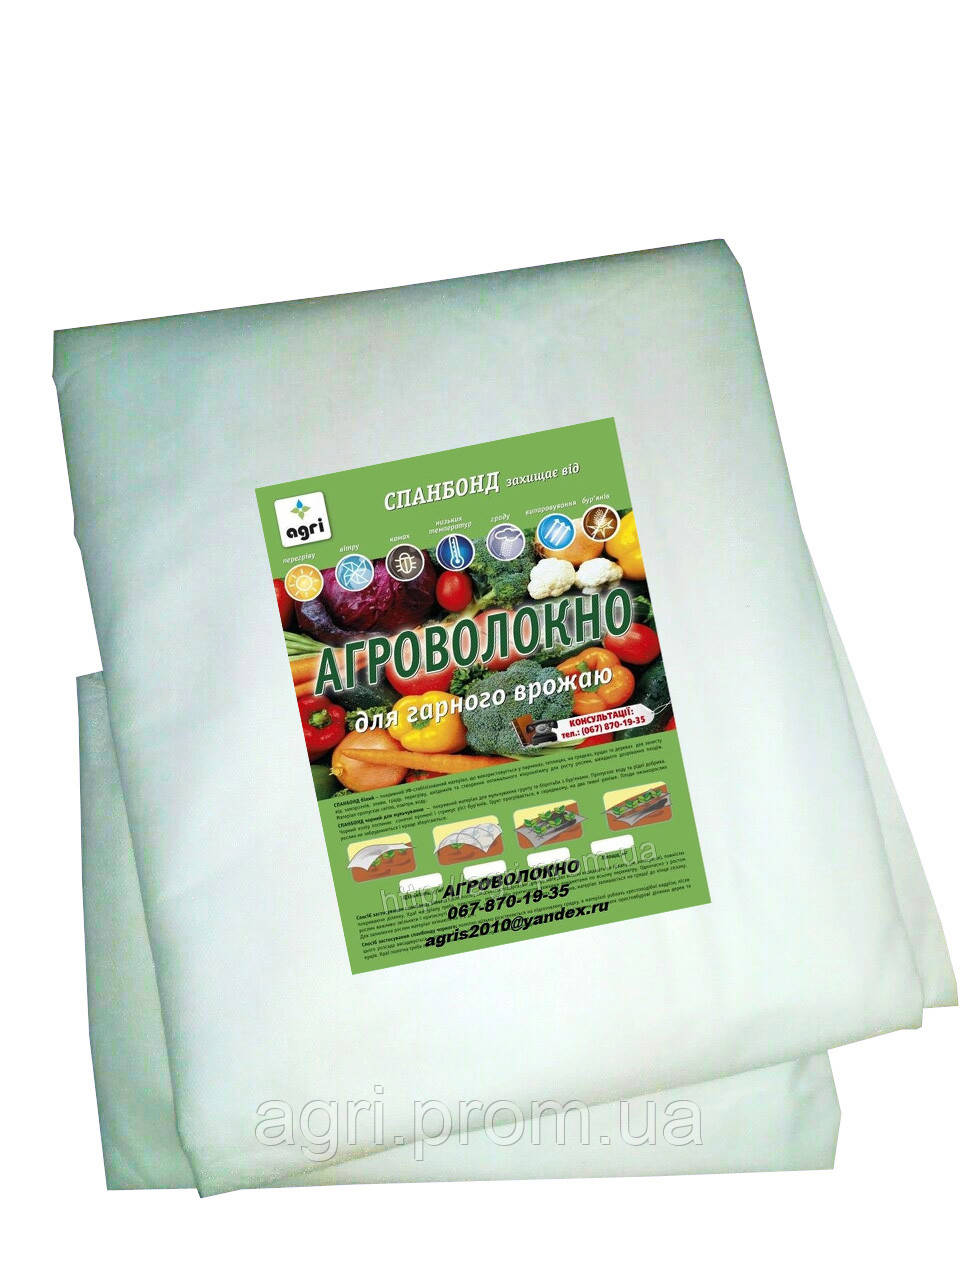 Агроволокно Агротекс 23 г/м2 (3,2м*10м) купить